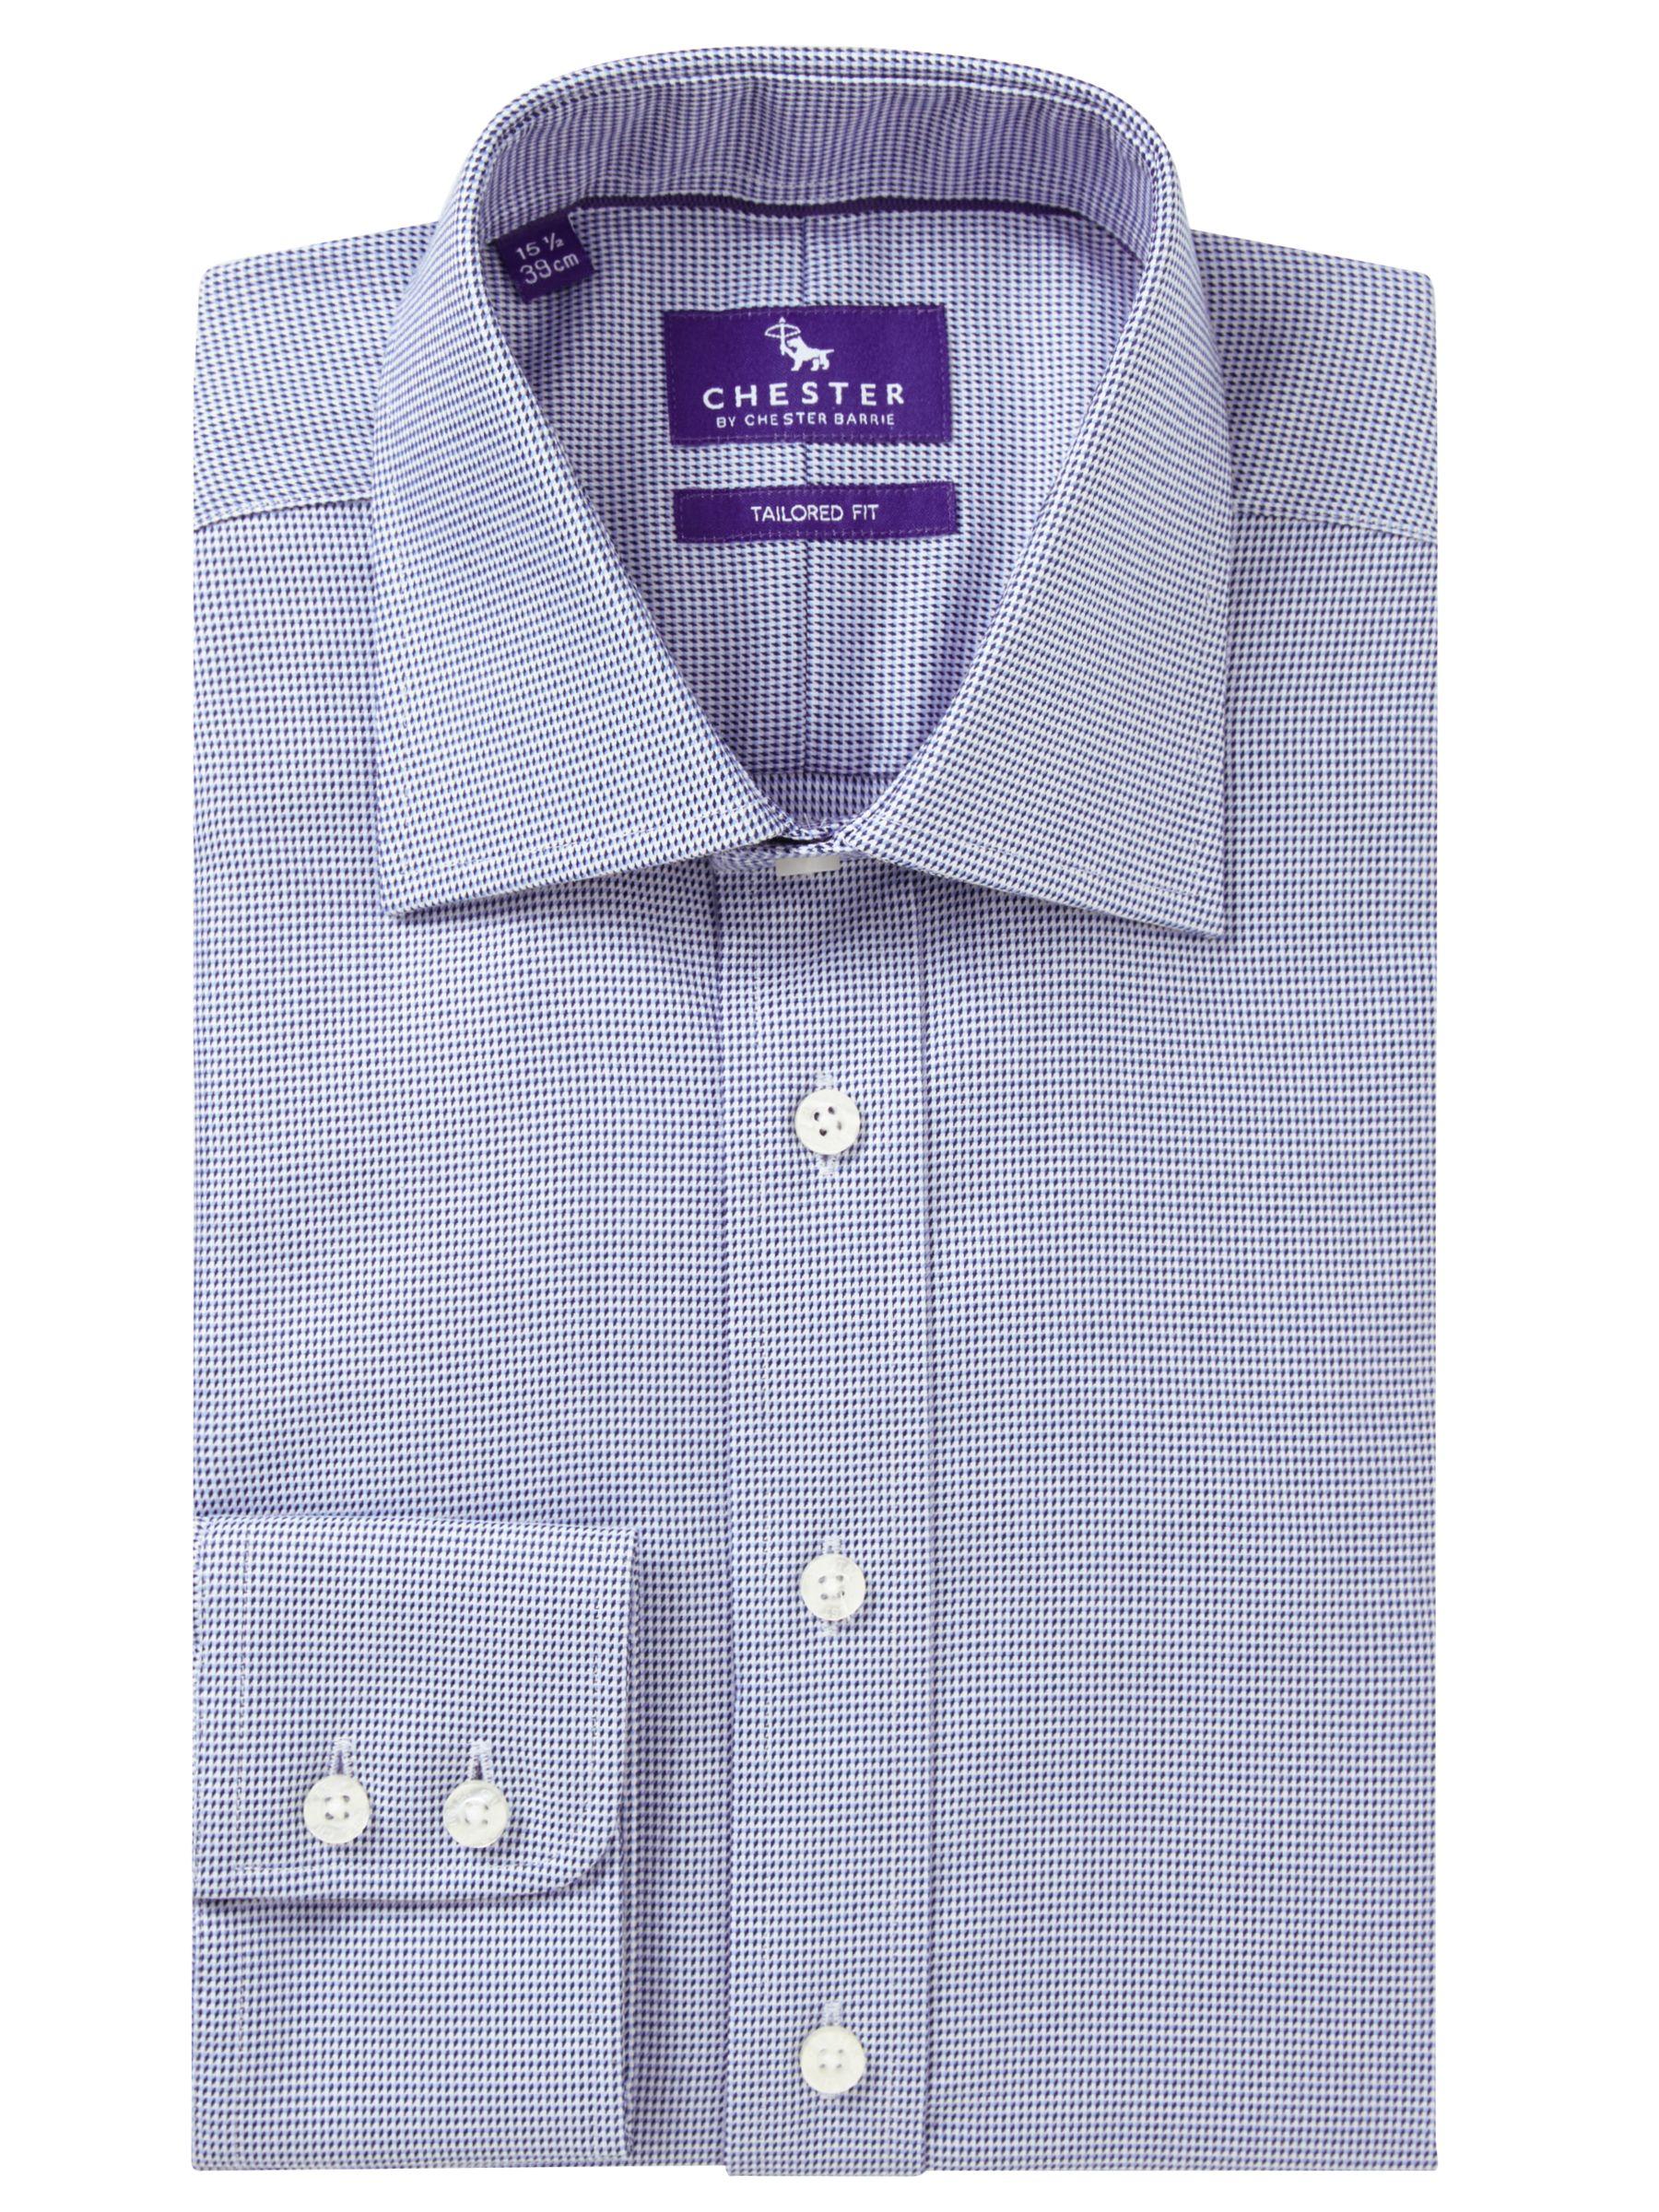 Chester by Chester Barrie Chester by Chester Barrie Mini Chevron Tailored Fit Shirt